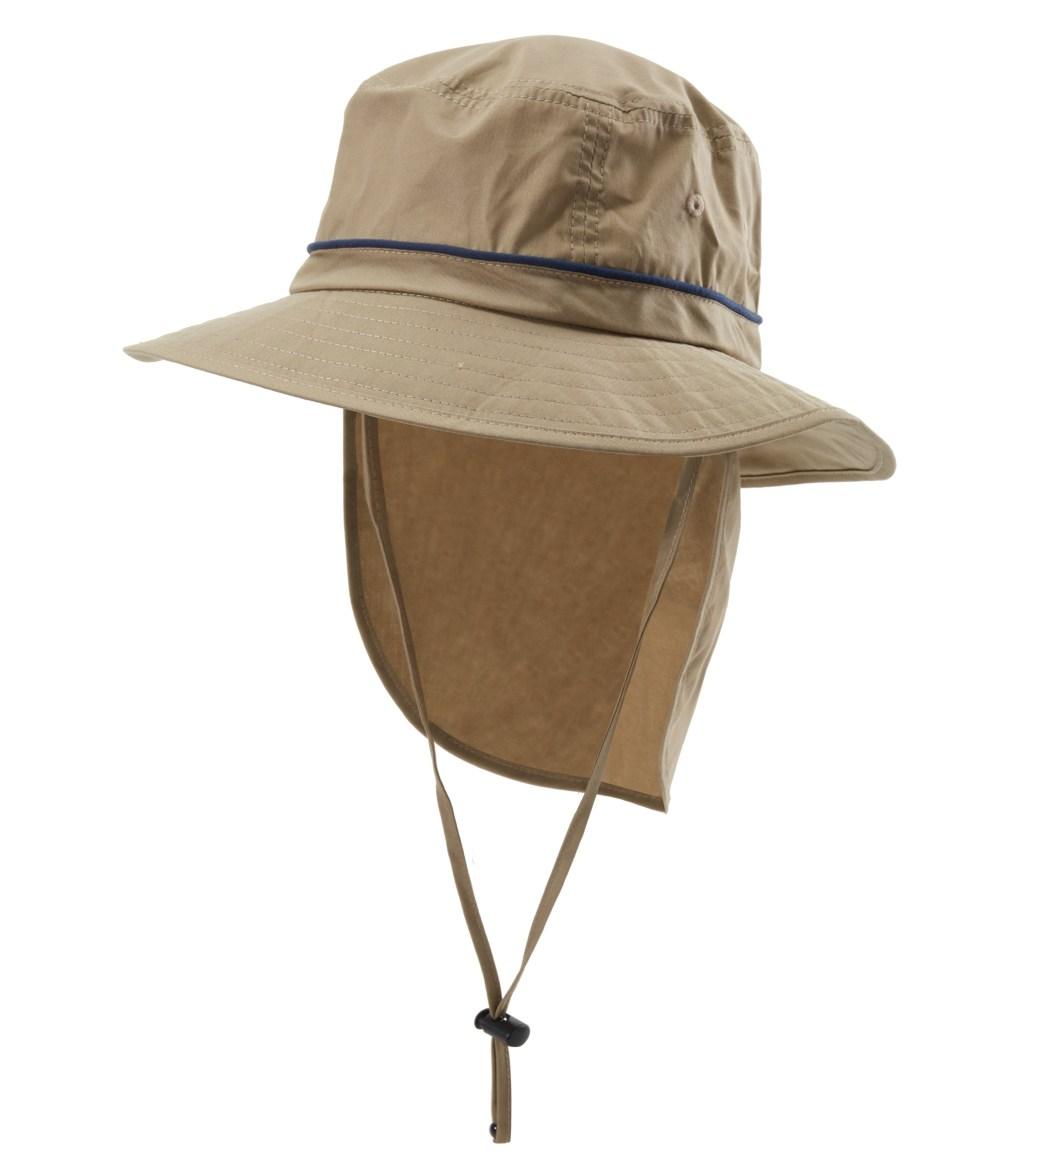 Wallaroo Men s Shelton Sun Hat at SwimOutlet.com 066fad842f81